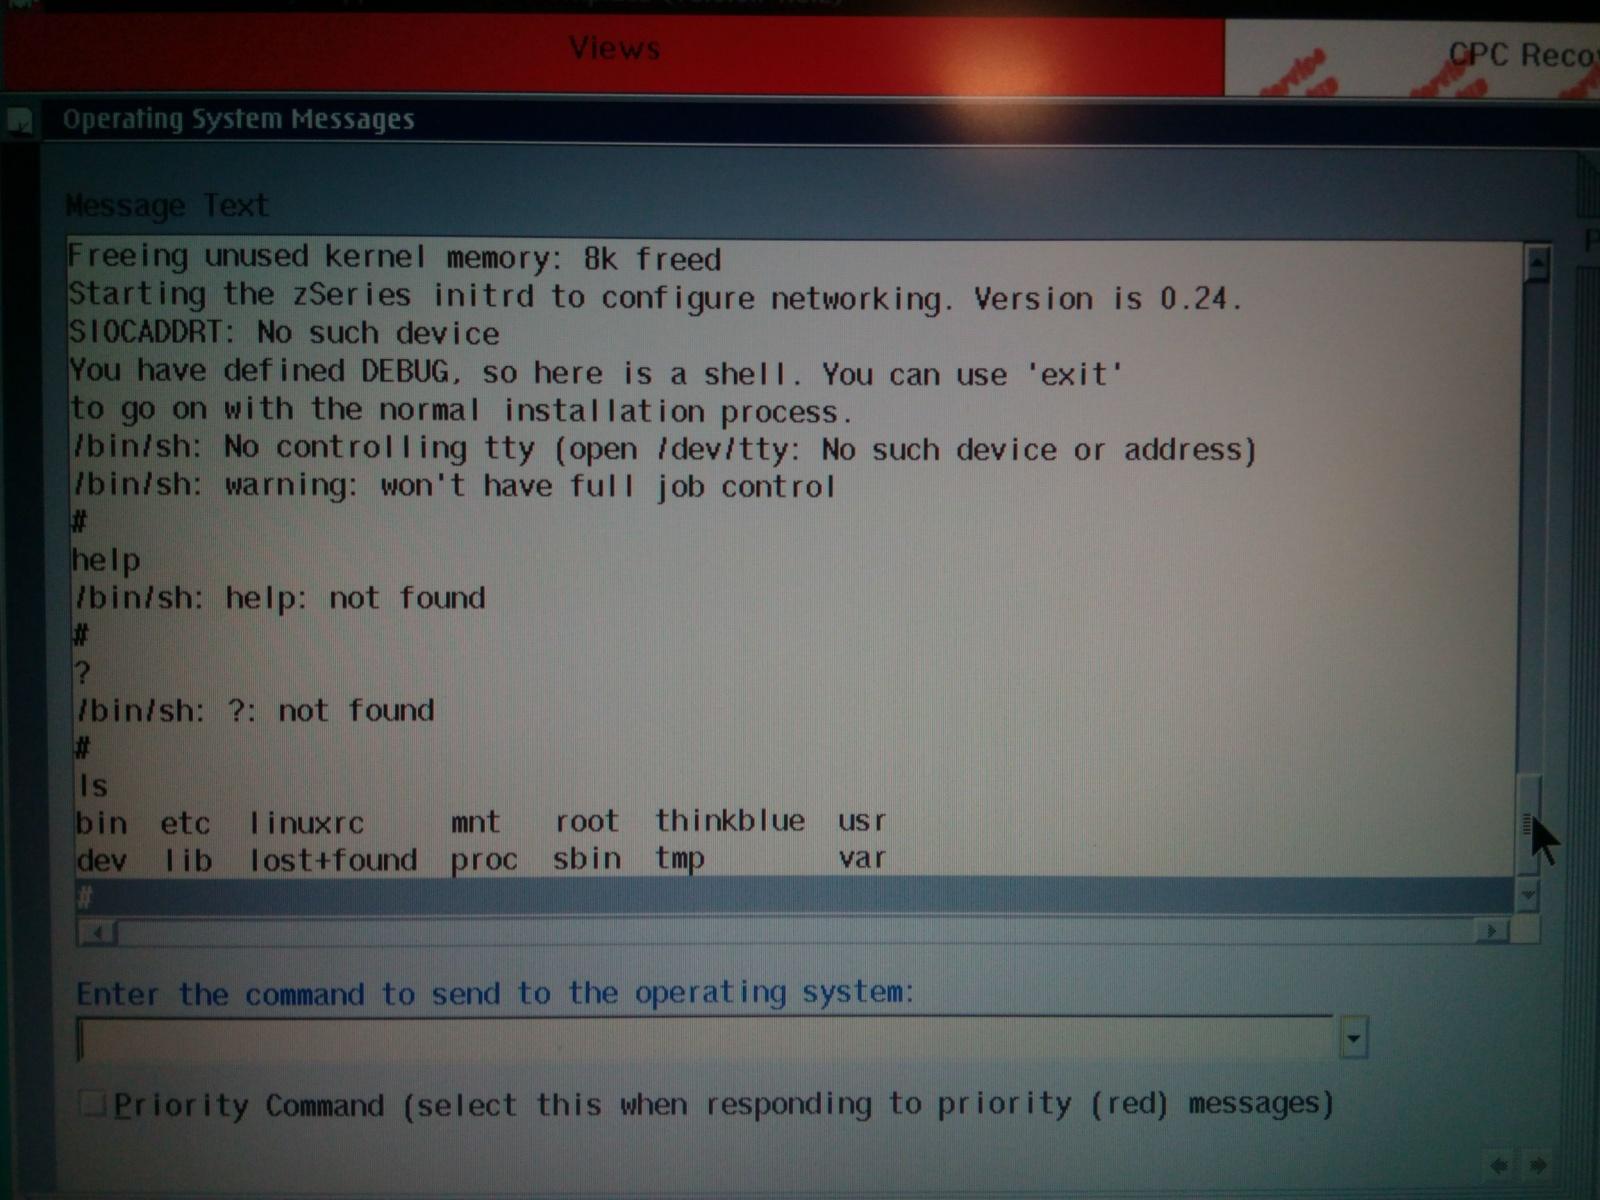 18-летний энтузиаст купил и установил в подвале мейнфрейм IBM z890 (2004 год) - 19